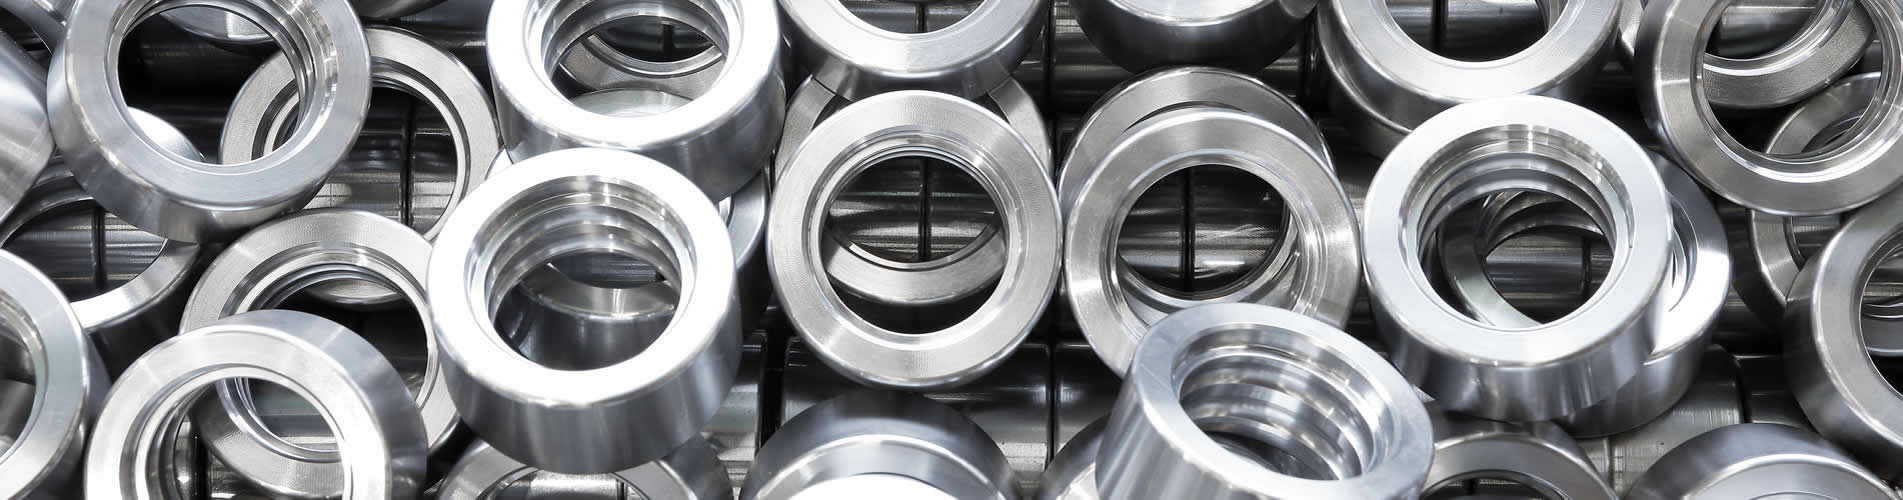 Piezas metálicas fabricadas por mecanizado bajo plano